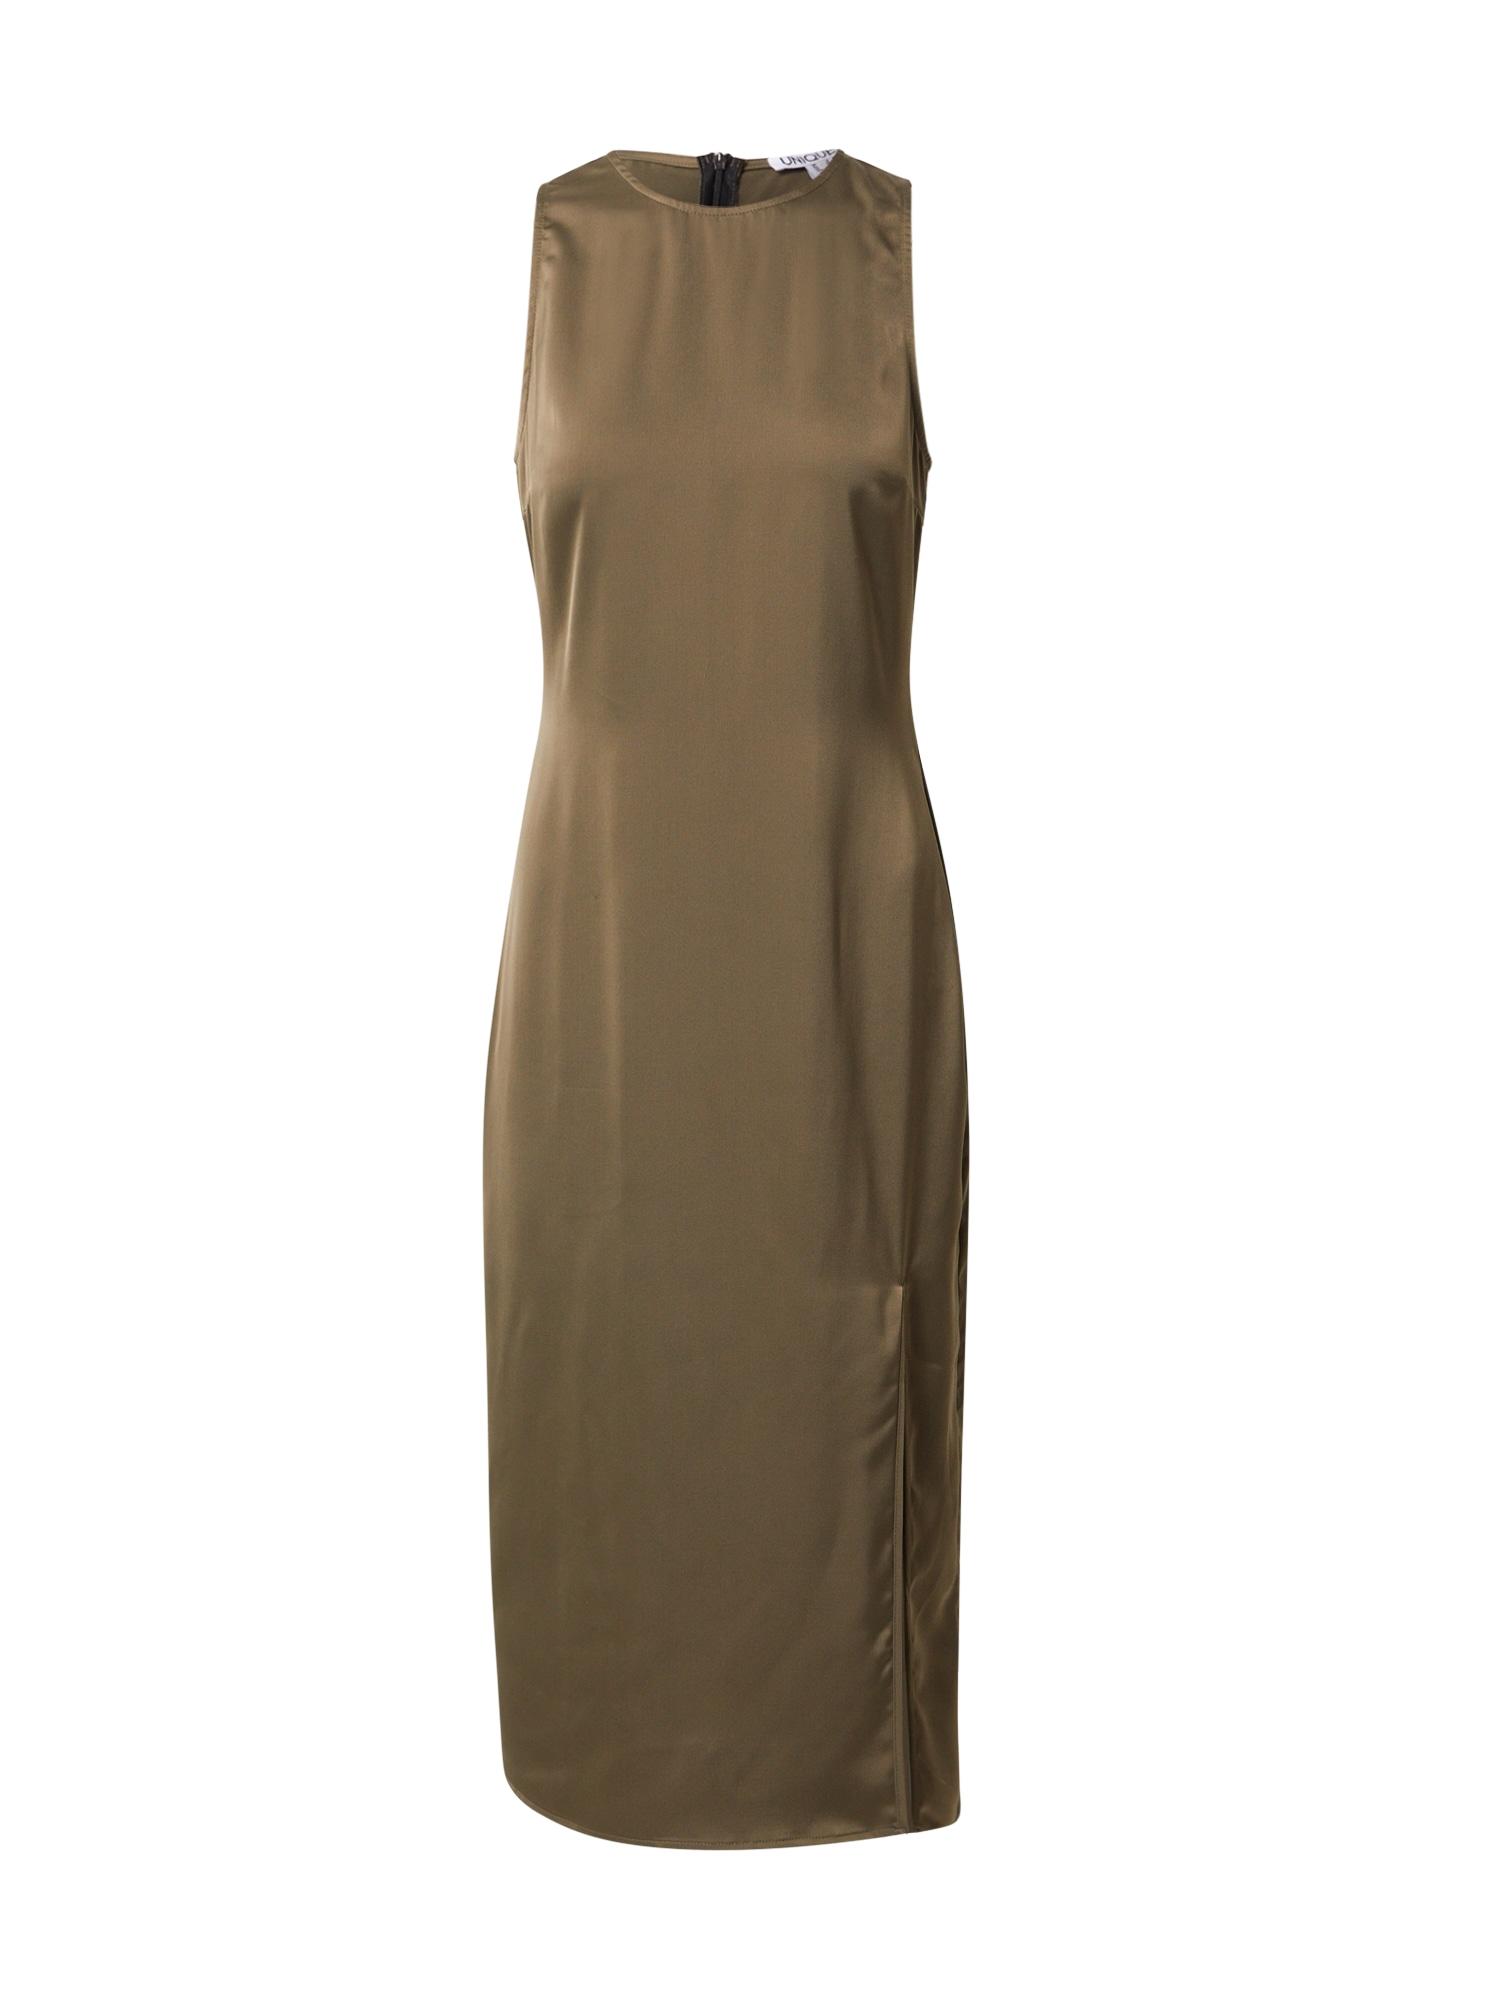 Unique21 Suknelė rusvai žalia